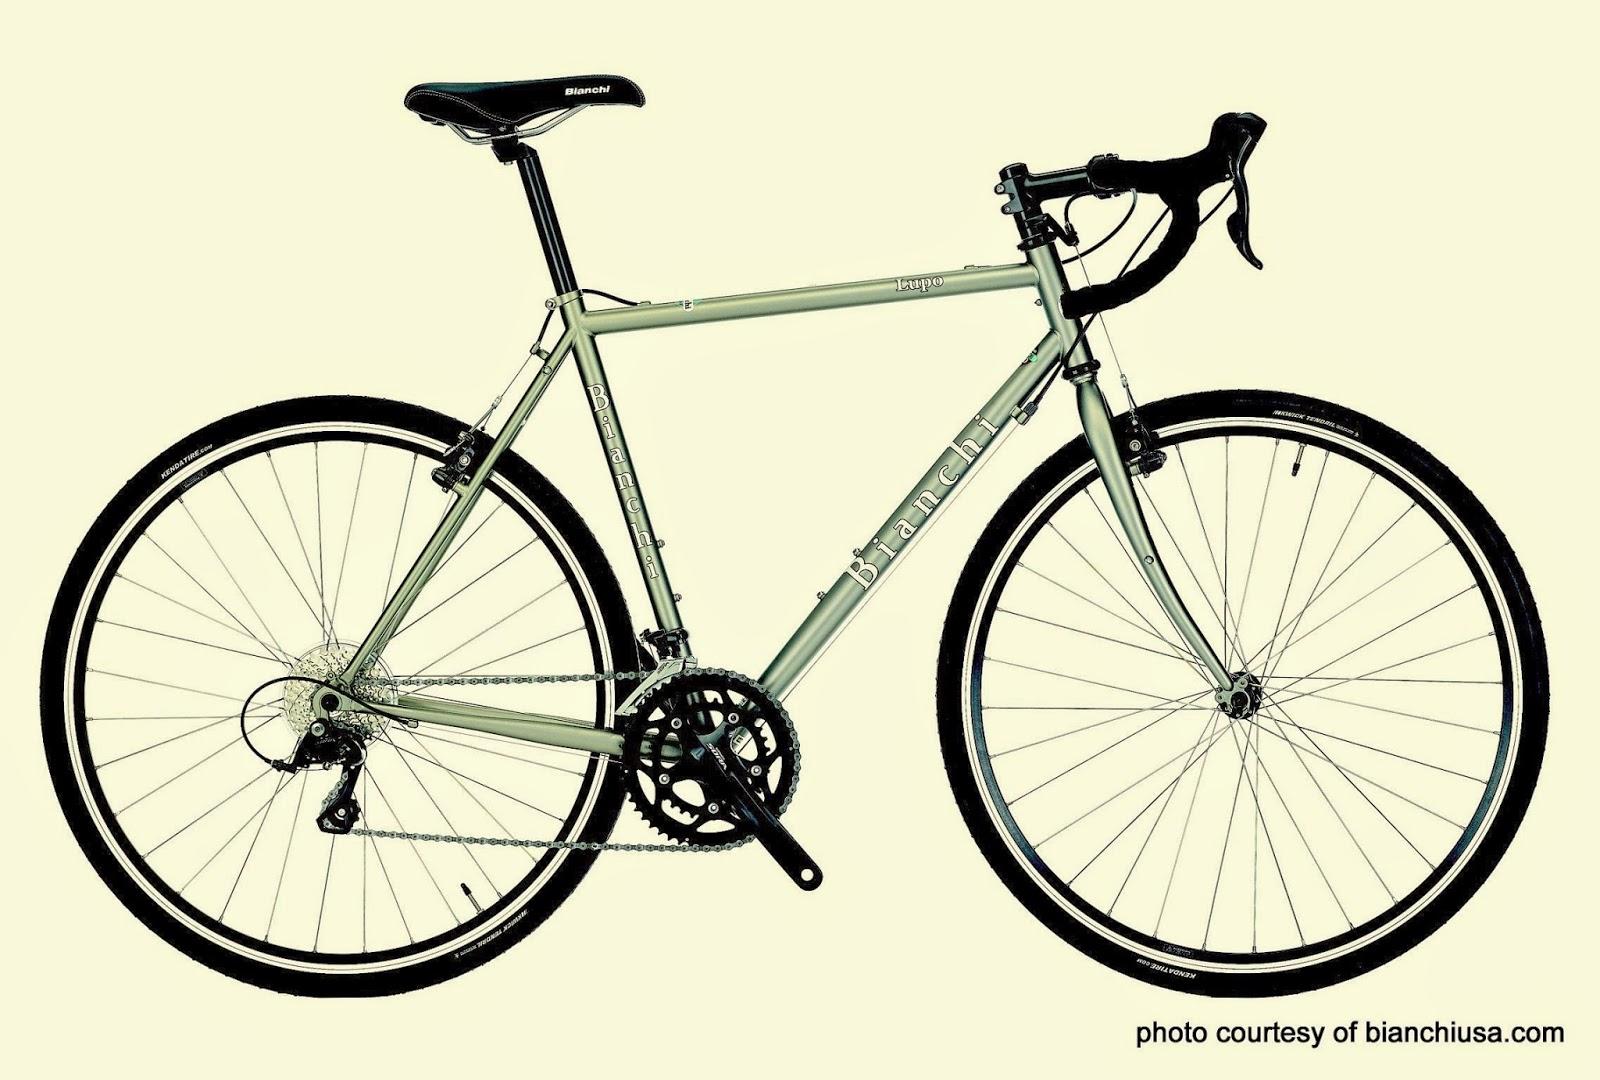 bianchi lupo, commuter, gravel, cyclocross, touring, trekking, adventure